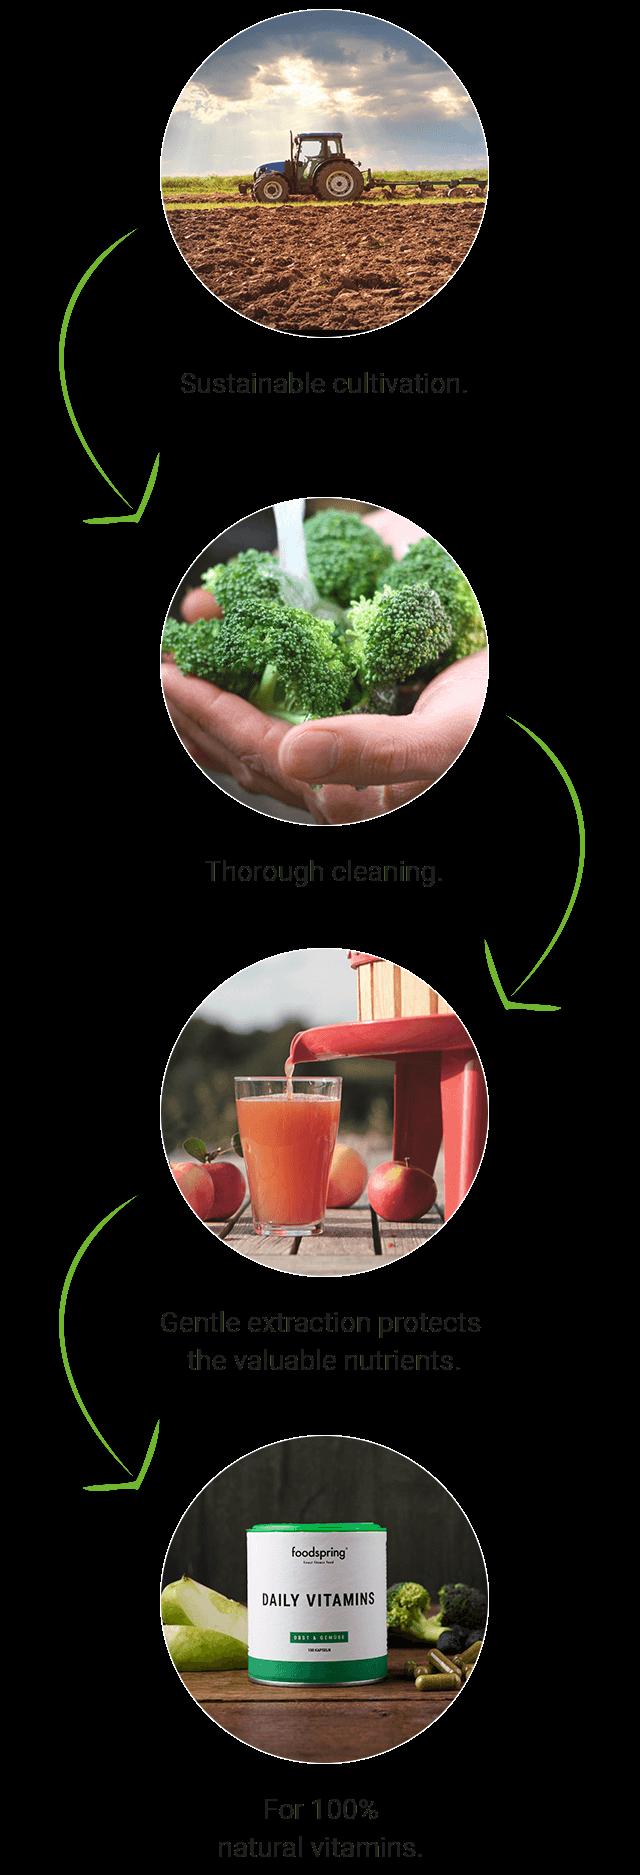 Daily Vitamins Buy Natural Foodspring Natures Way Multivitamin With Spirulina 200 Tablets Manufacturing Process Of Vitamin Capsules